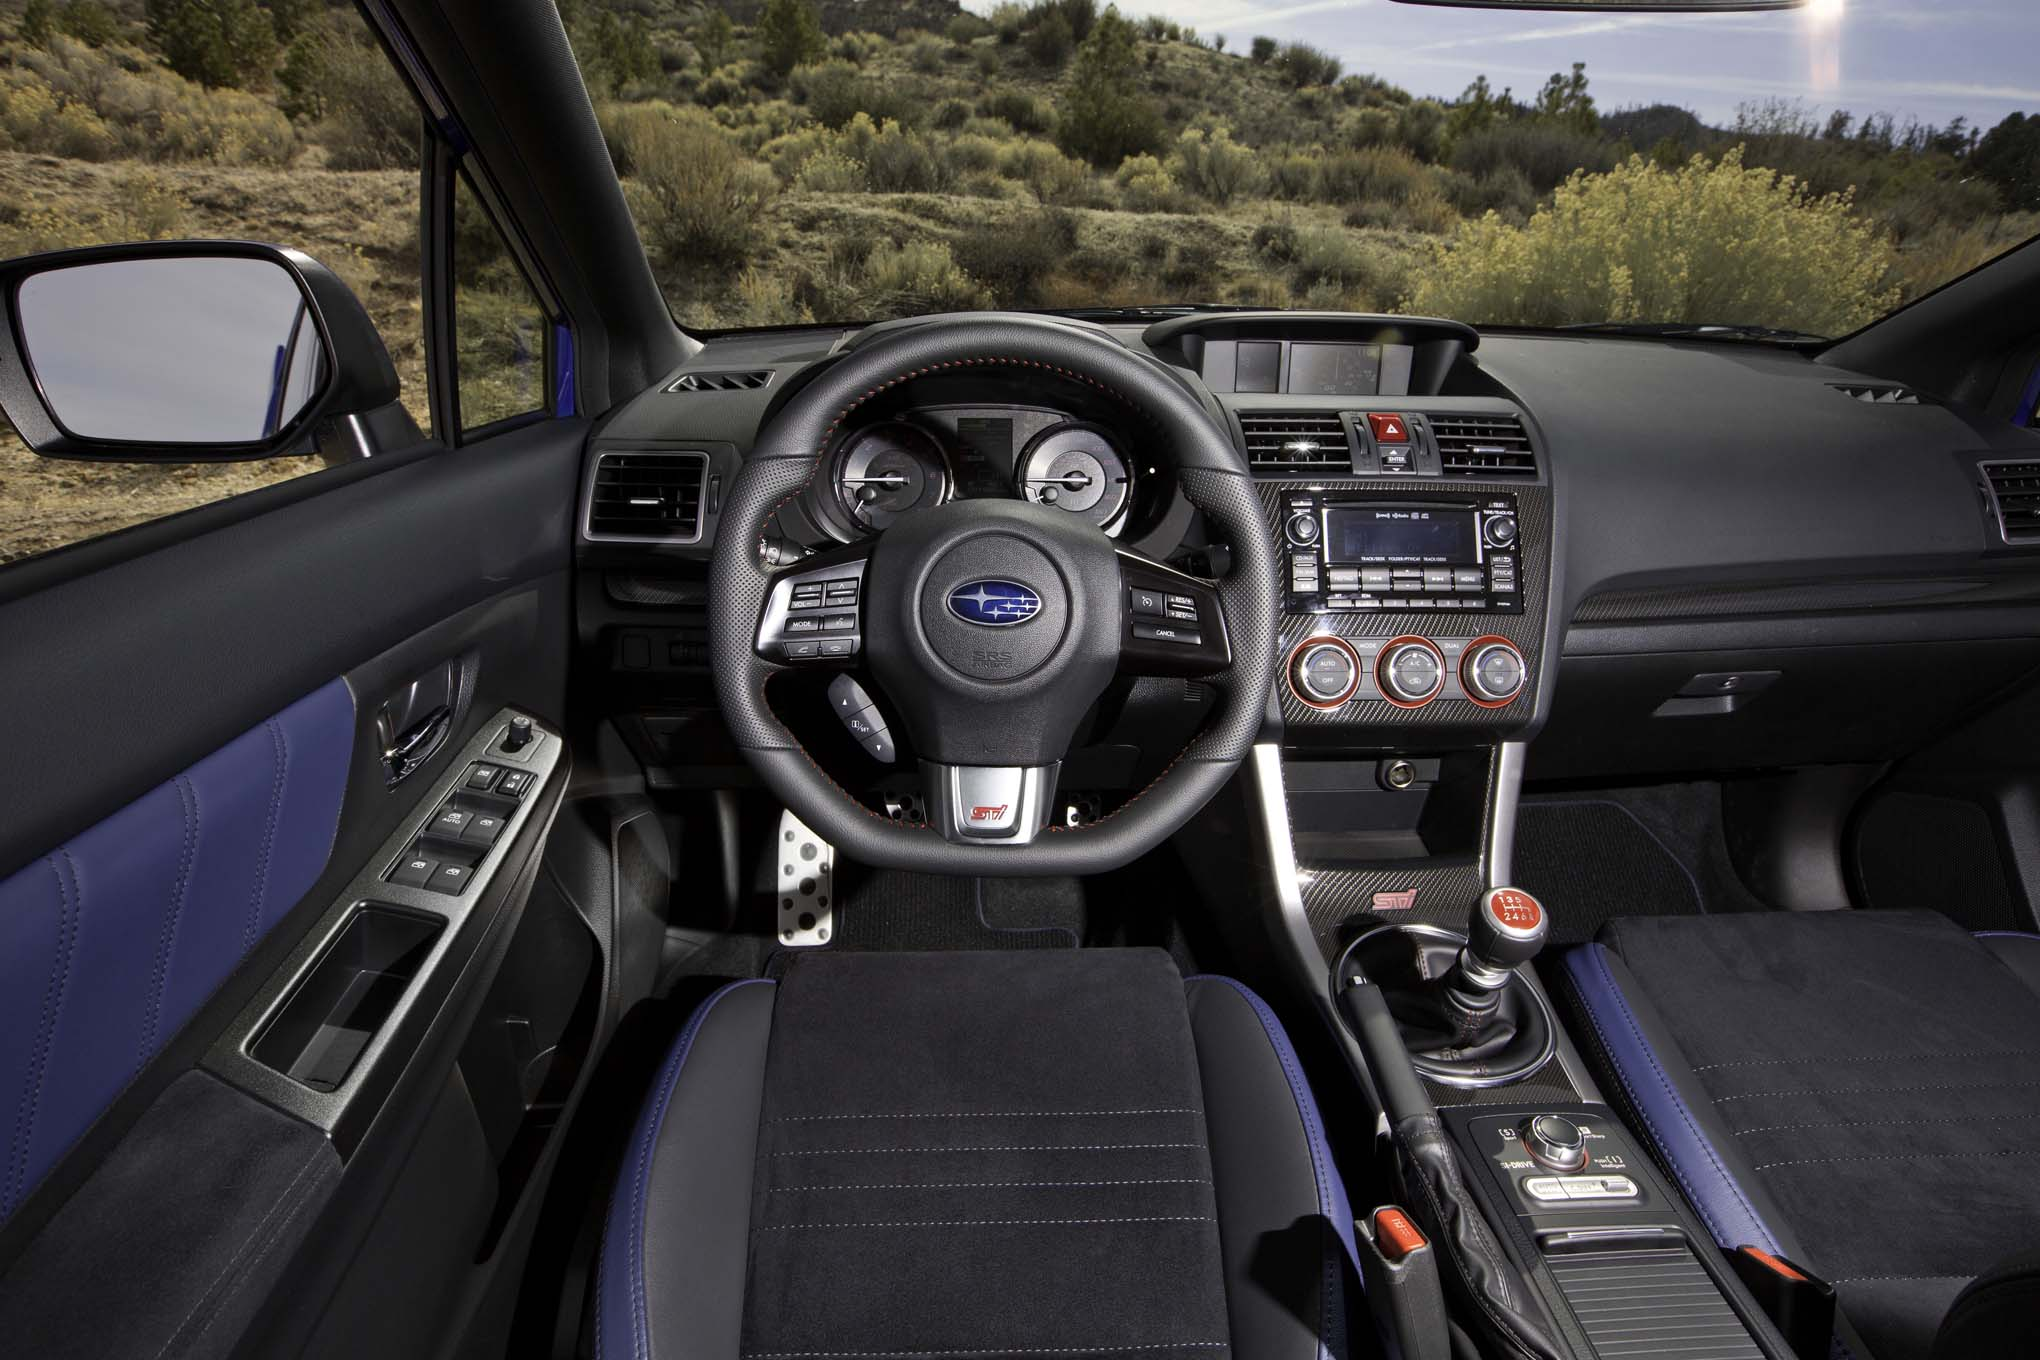 2015 Subaru WRX-STI Dashboard Cockpit Panels